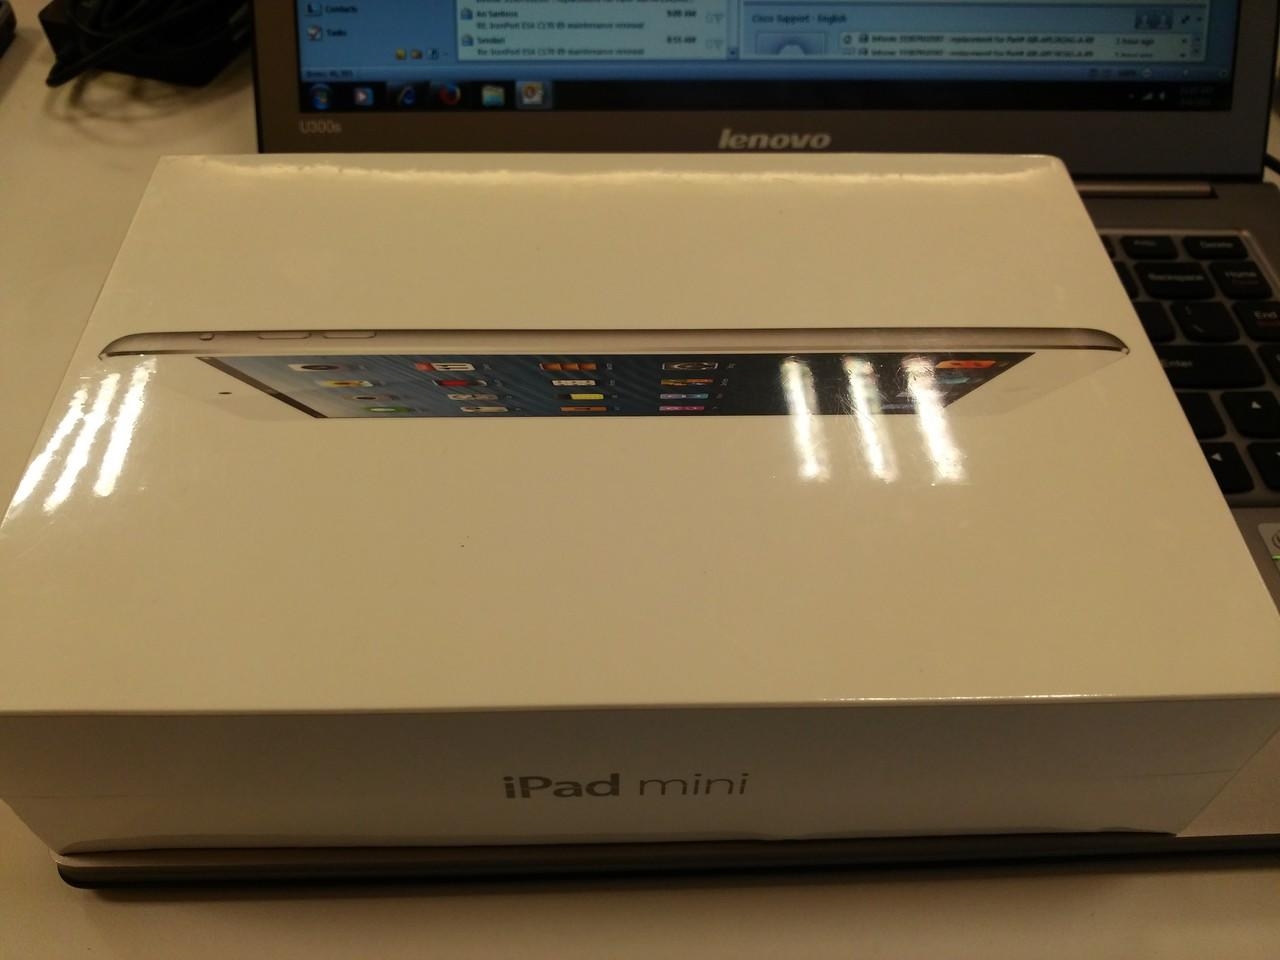 BNIB IPad Mini 16GB Wifi White